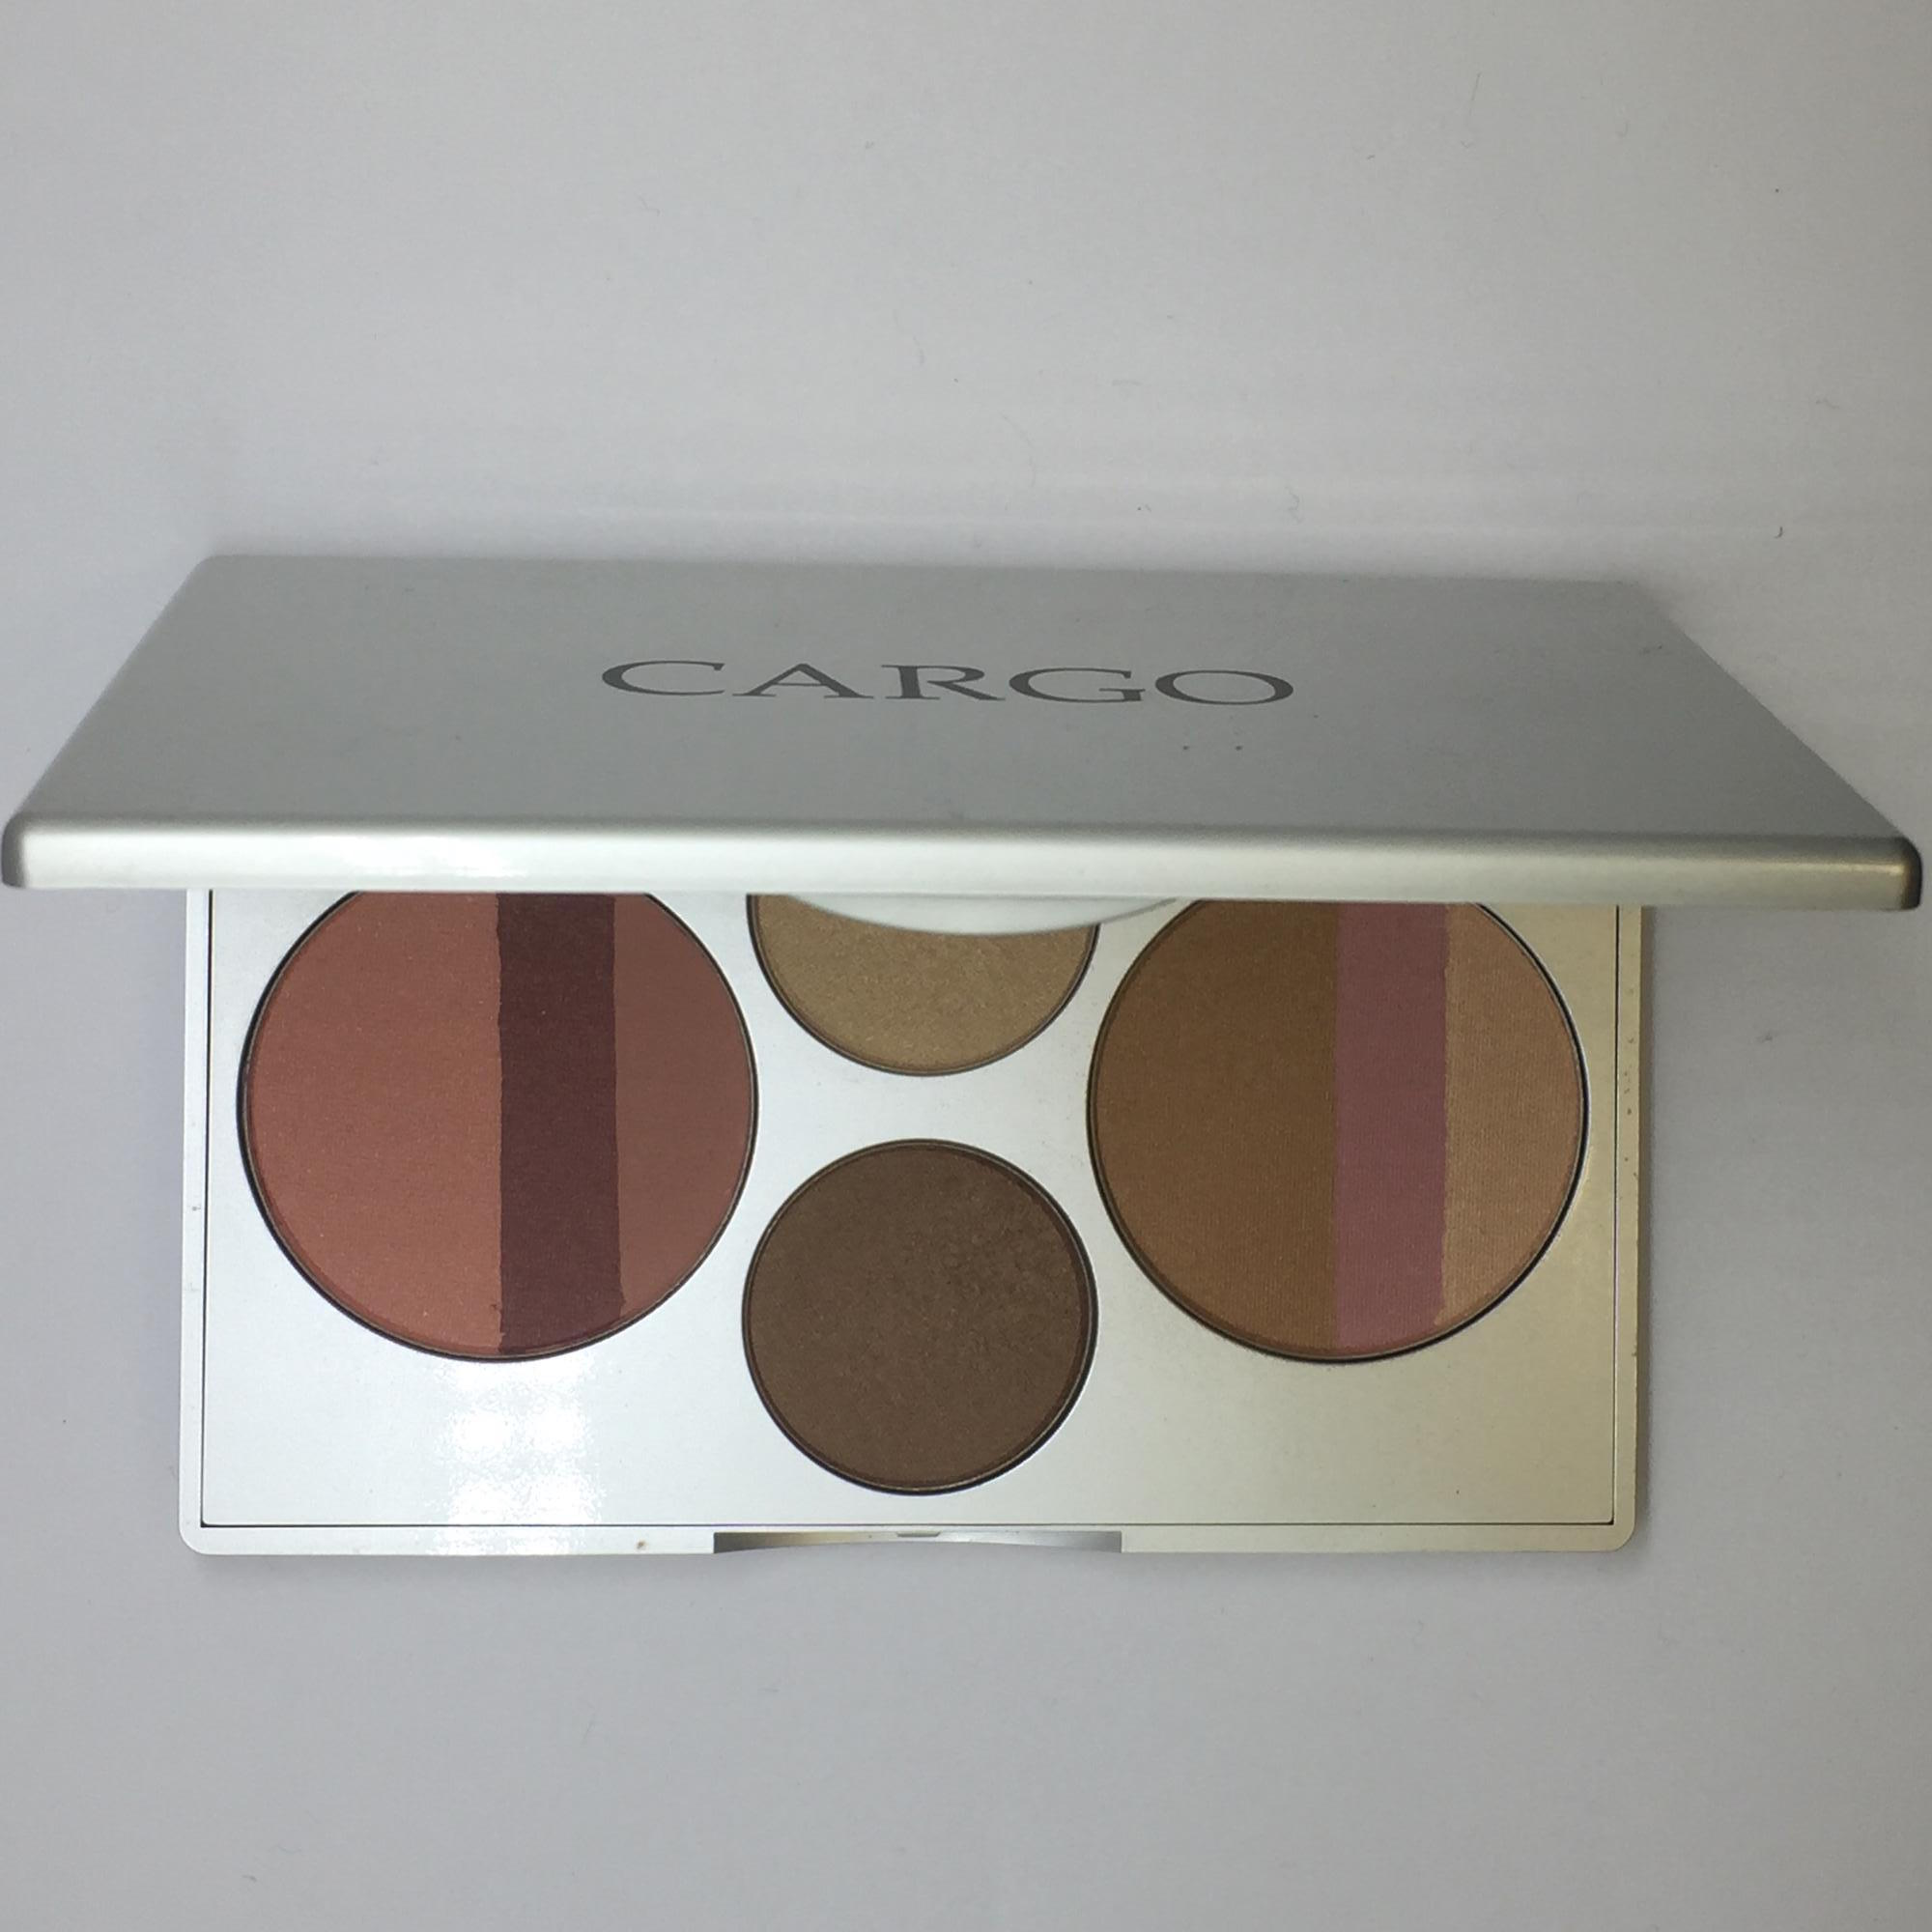 cargo 10th anniversary commemorative eye cheek palette